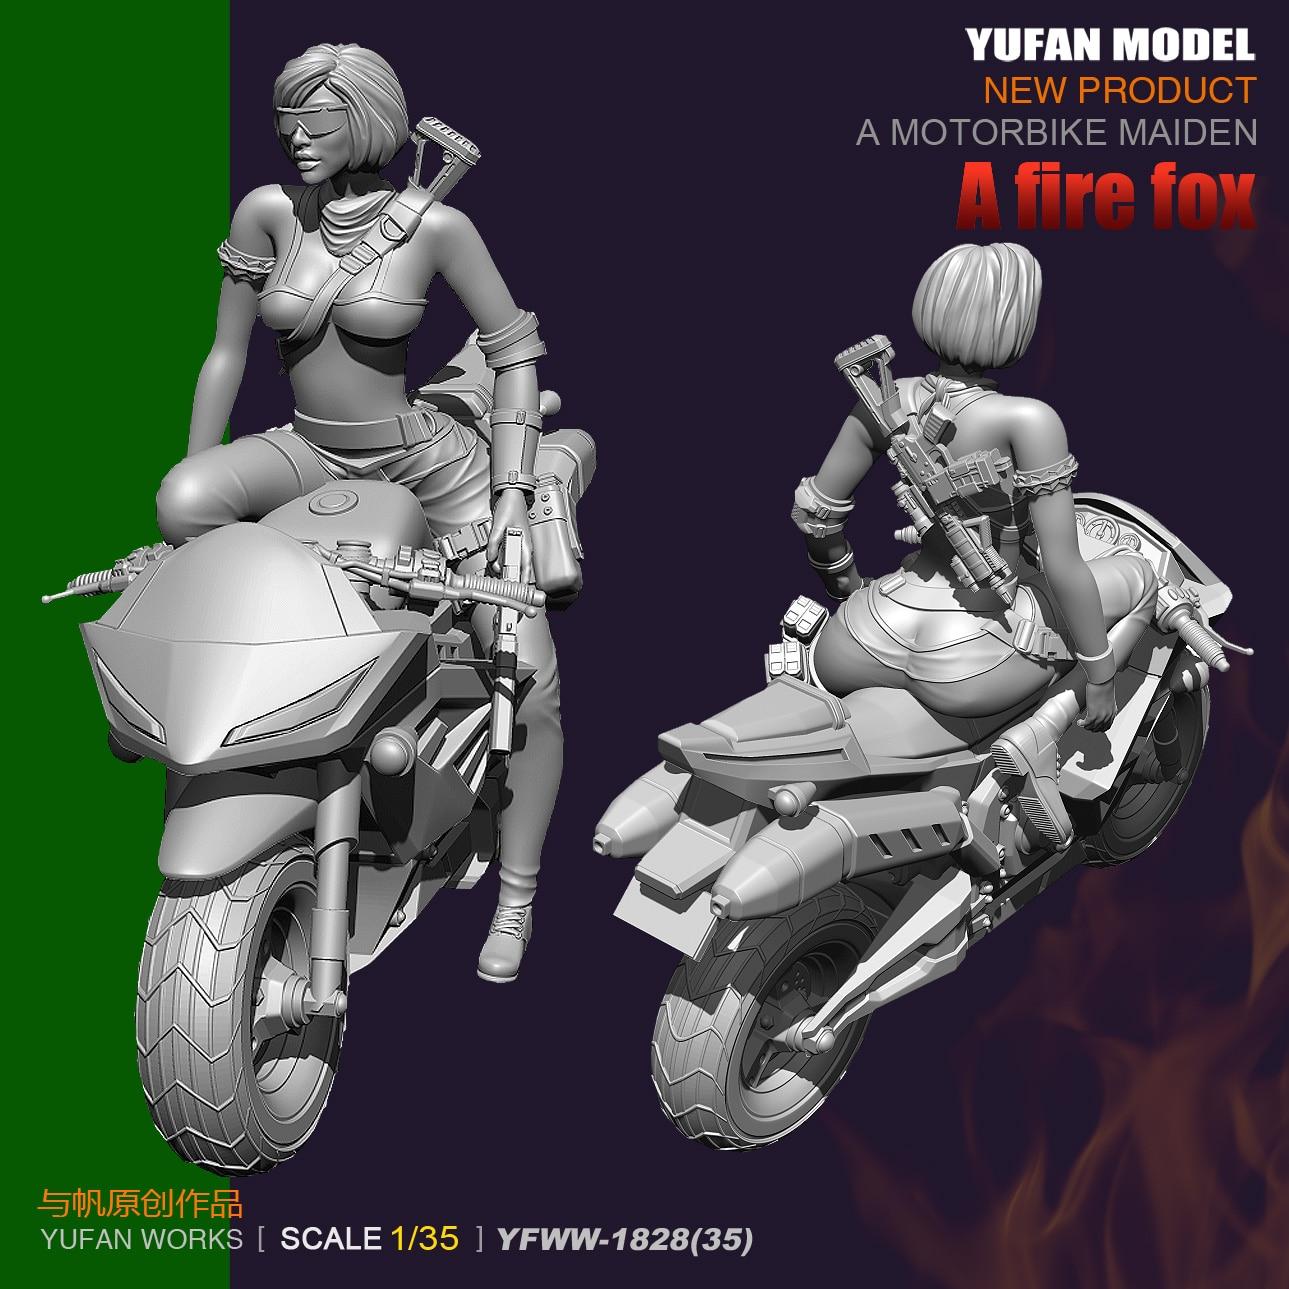 YuFan modelo y vela original 1/35 bicicleta eléctrica mujeres shooter resina soldados YFWW35-1828 KNL Hobby